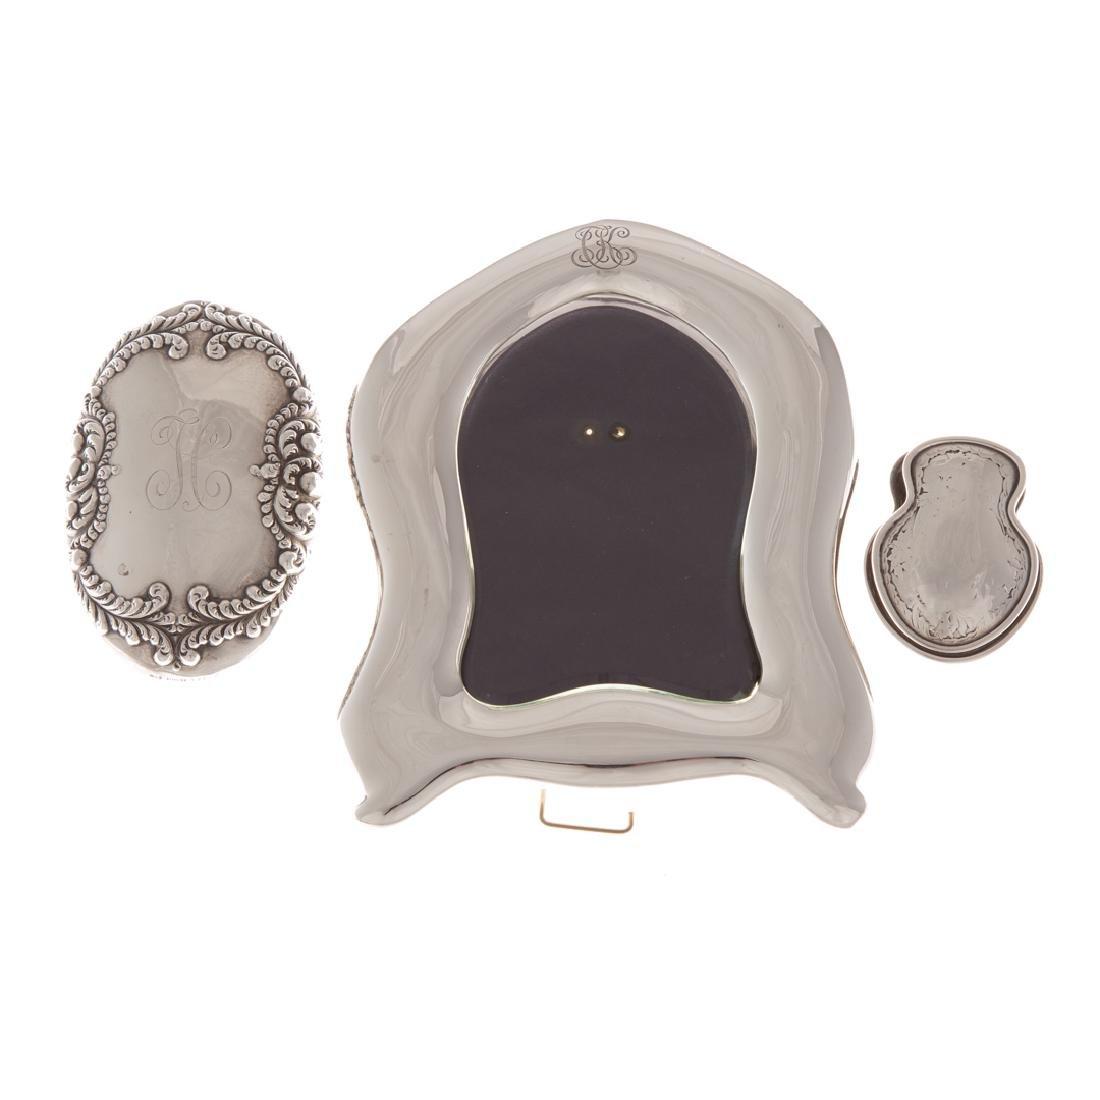 A Trio of sterling silver desk items